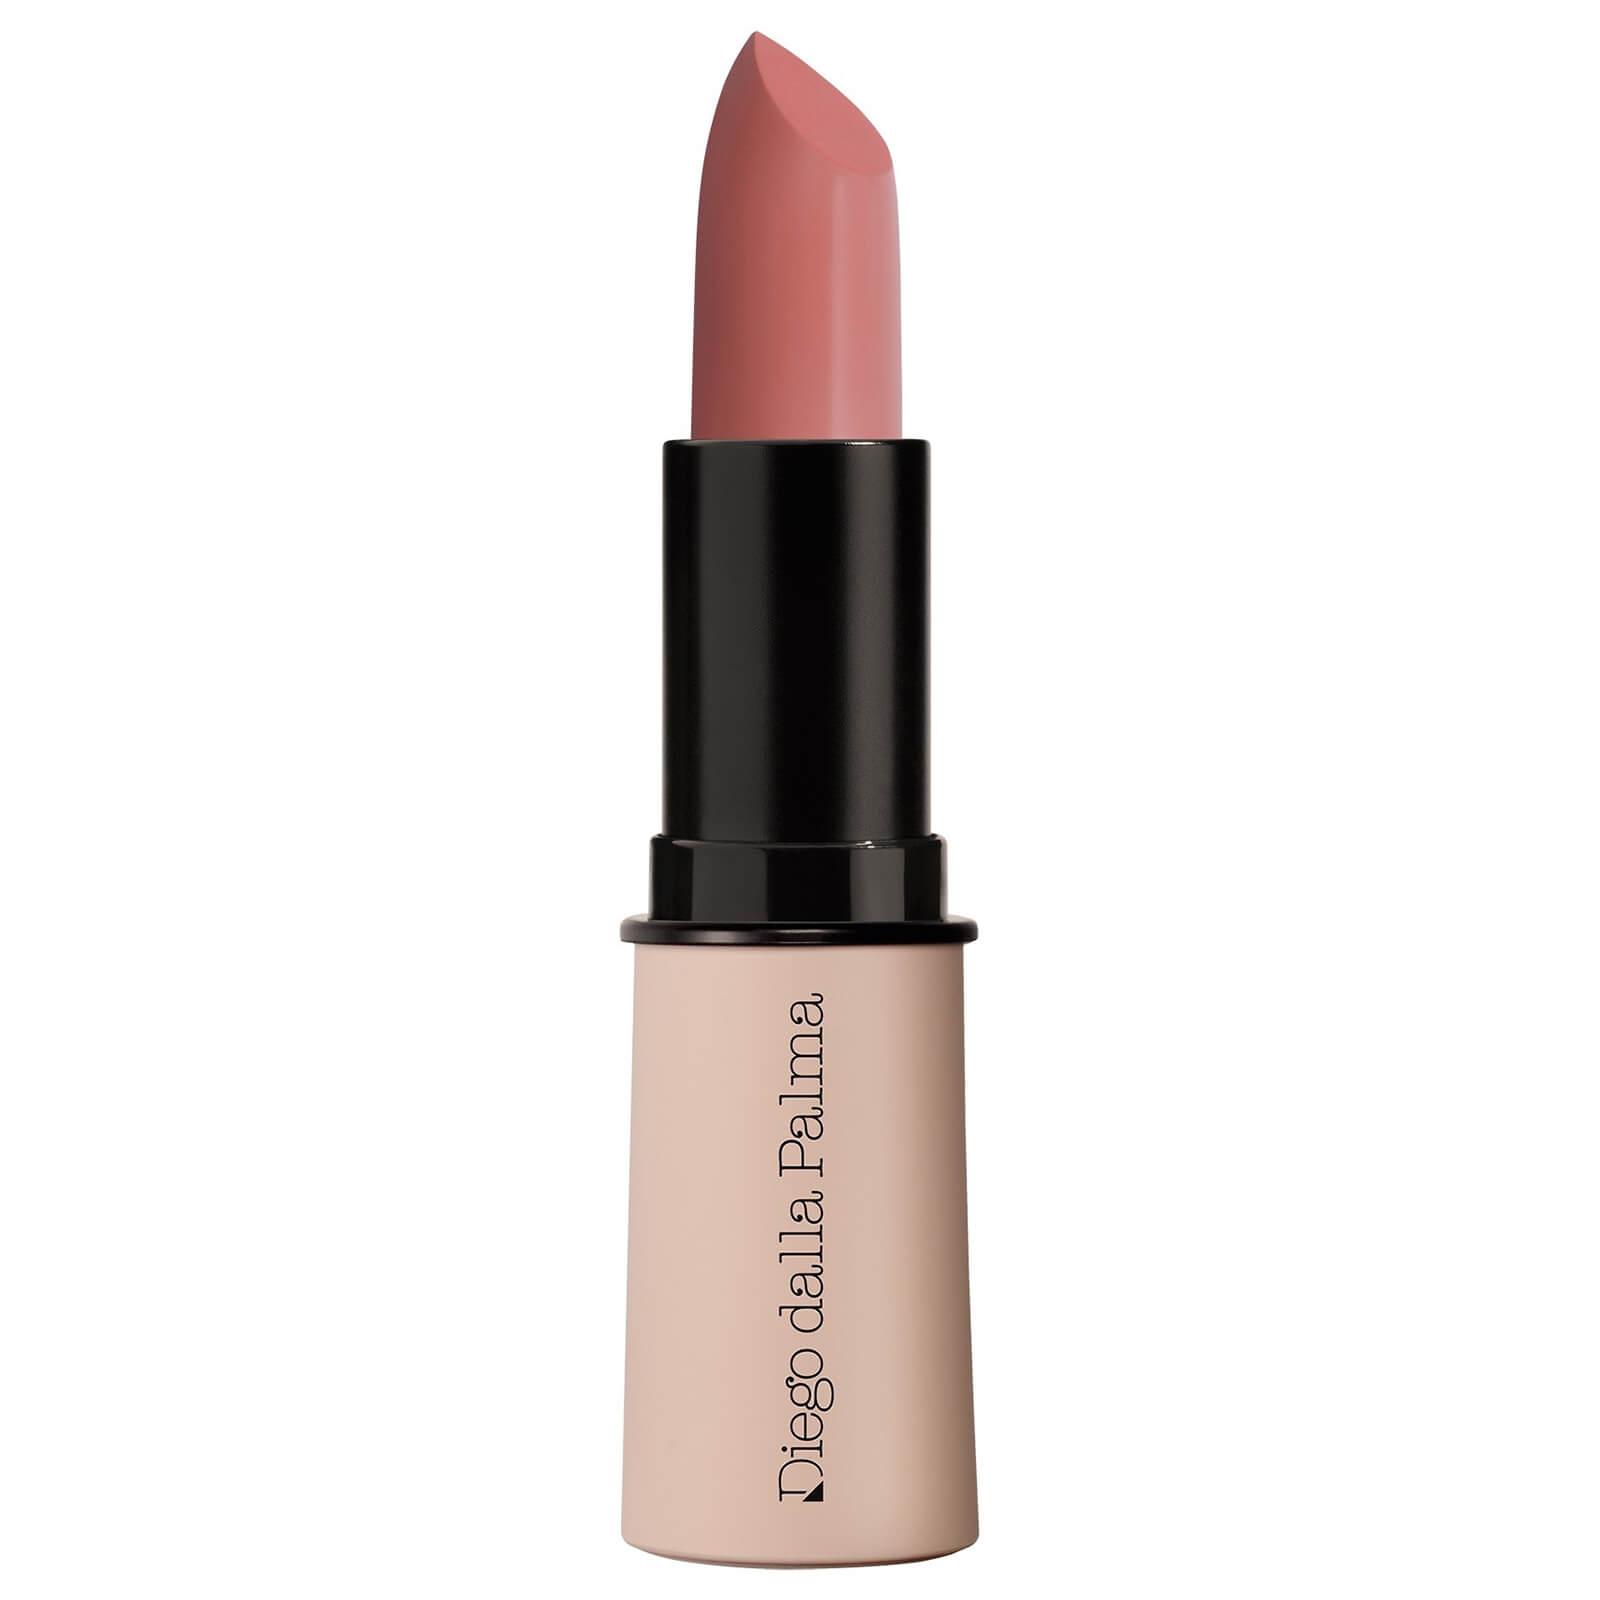 Купить Diego Dalla Palma Nudissimo Lipstick Lady Nude (Various Shades) - 202 Brown Nude